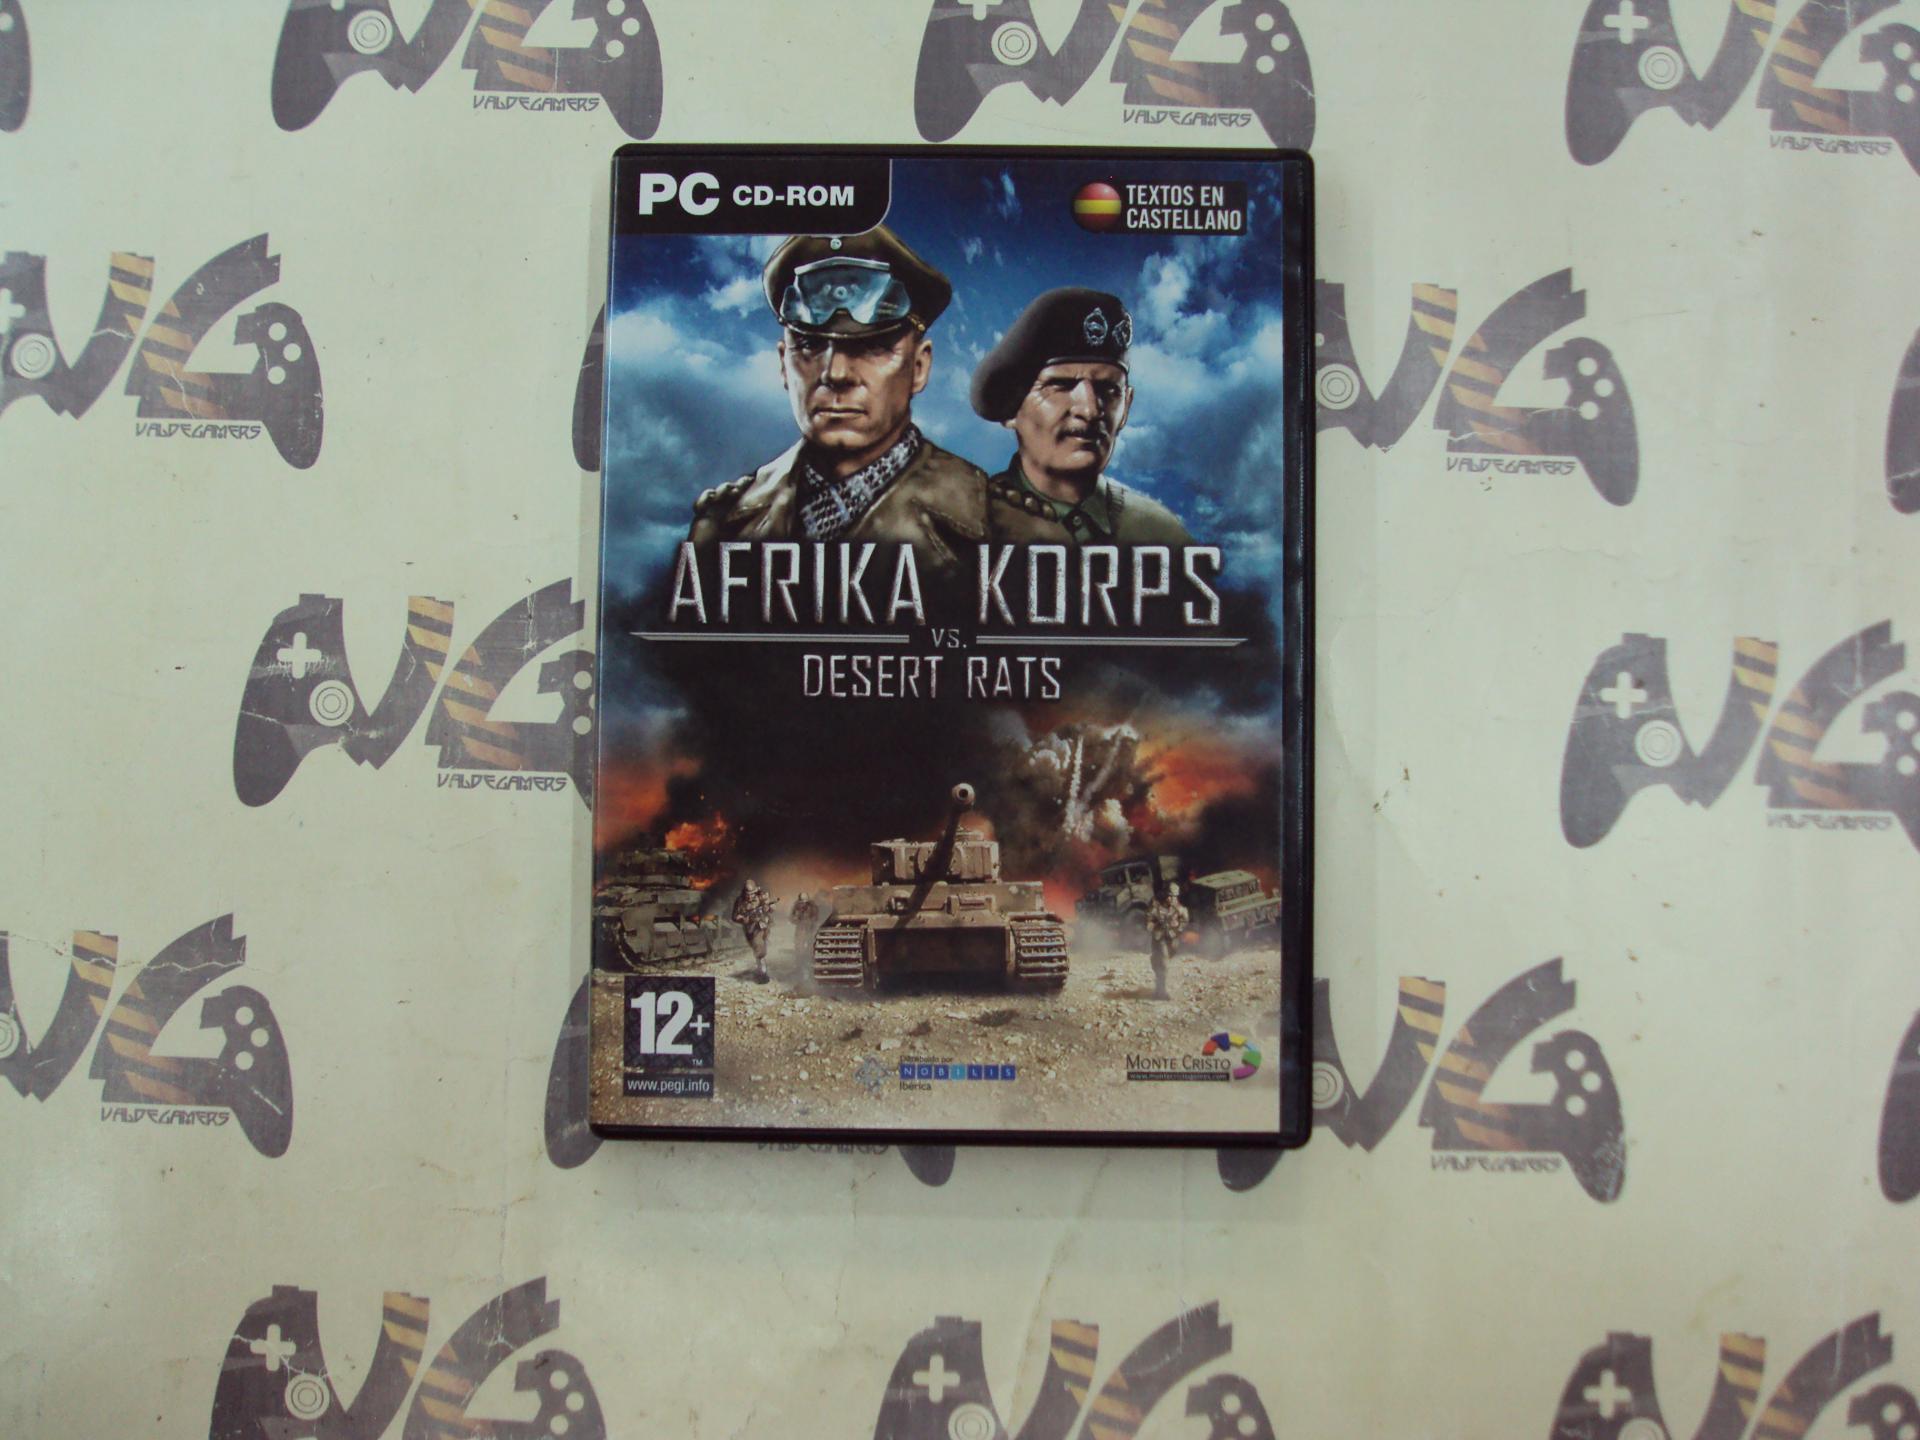 Afrika Corps vs Desert Rats